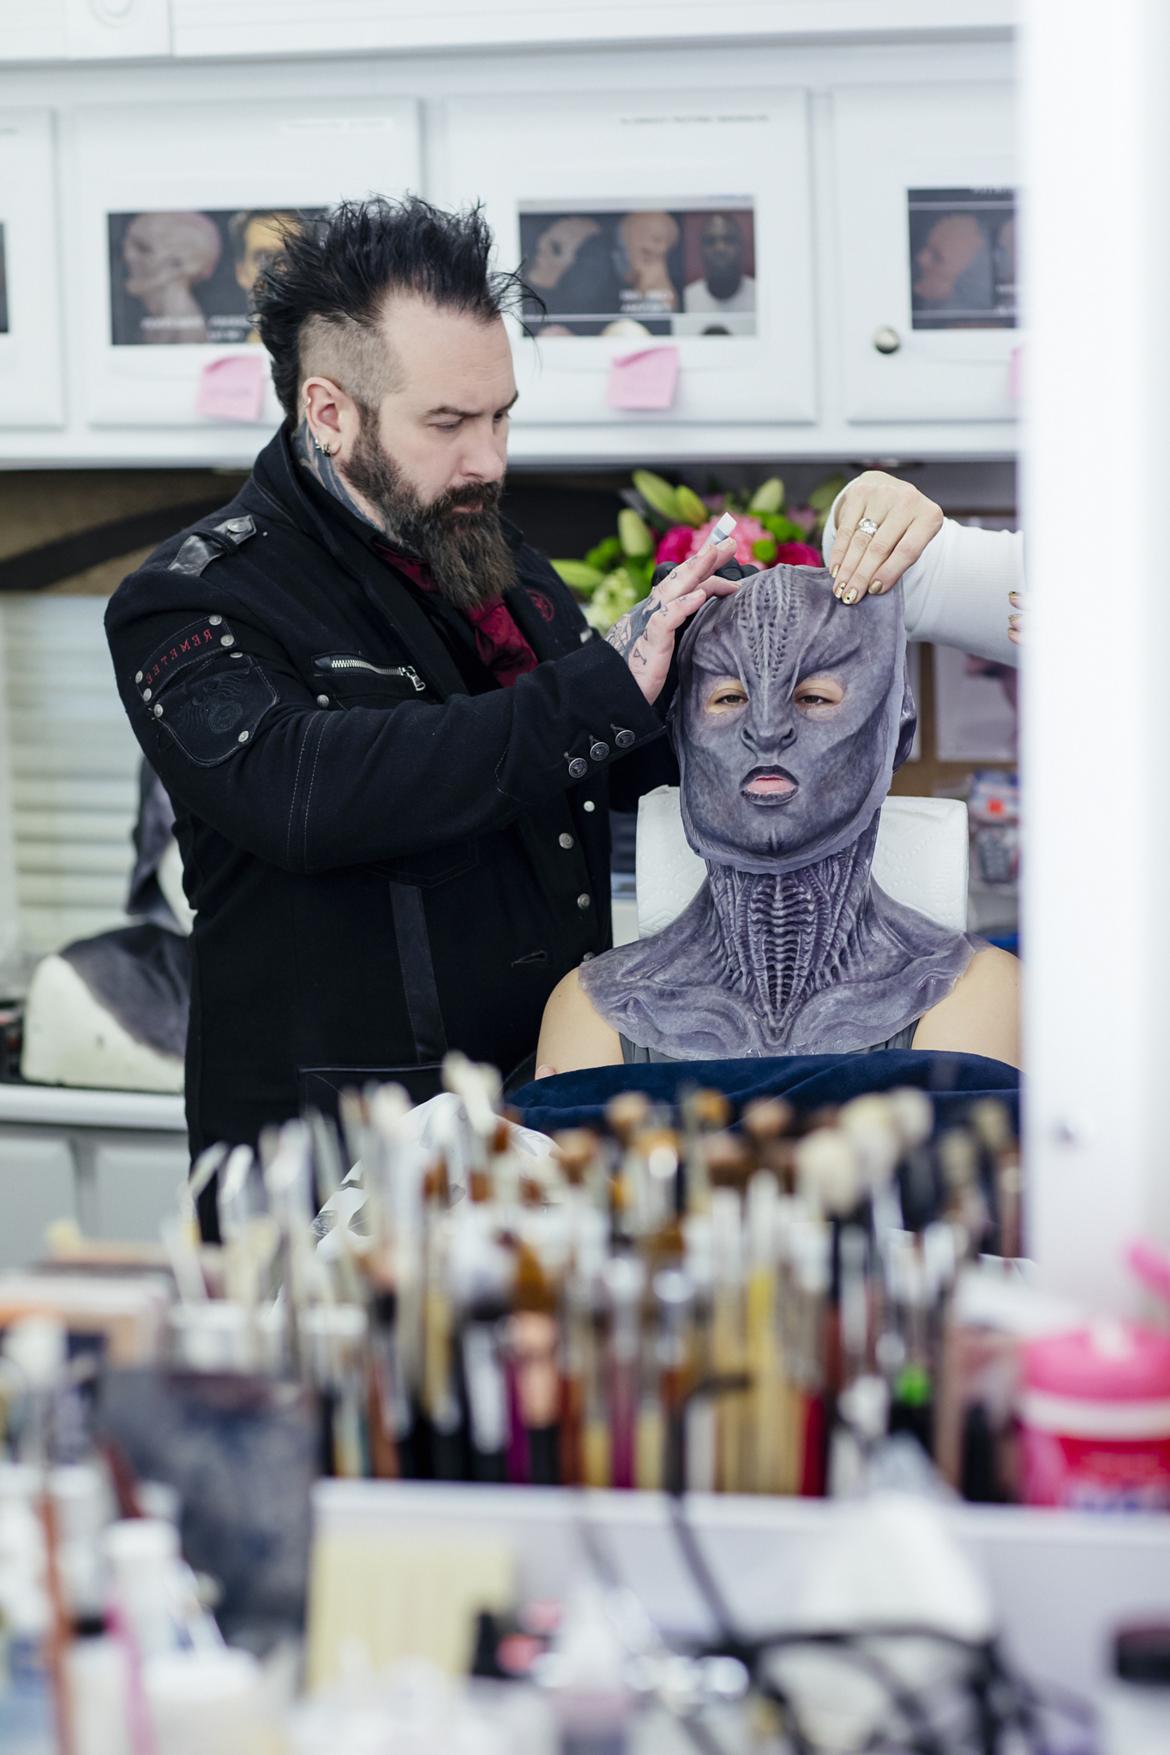 Star Trek makeup